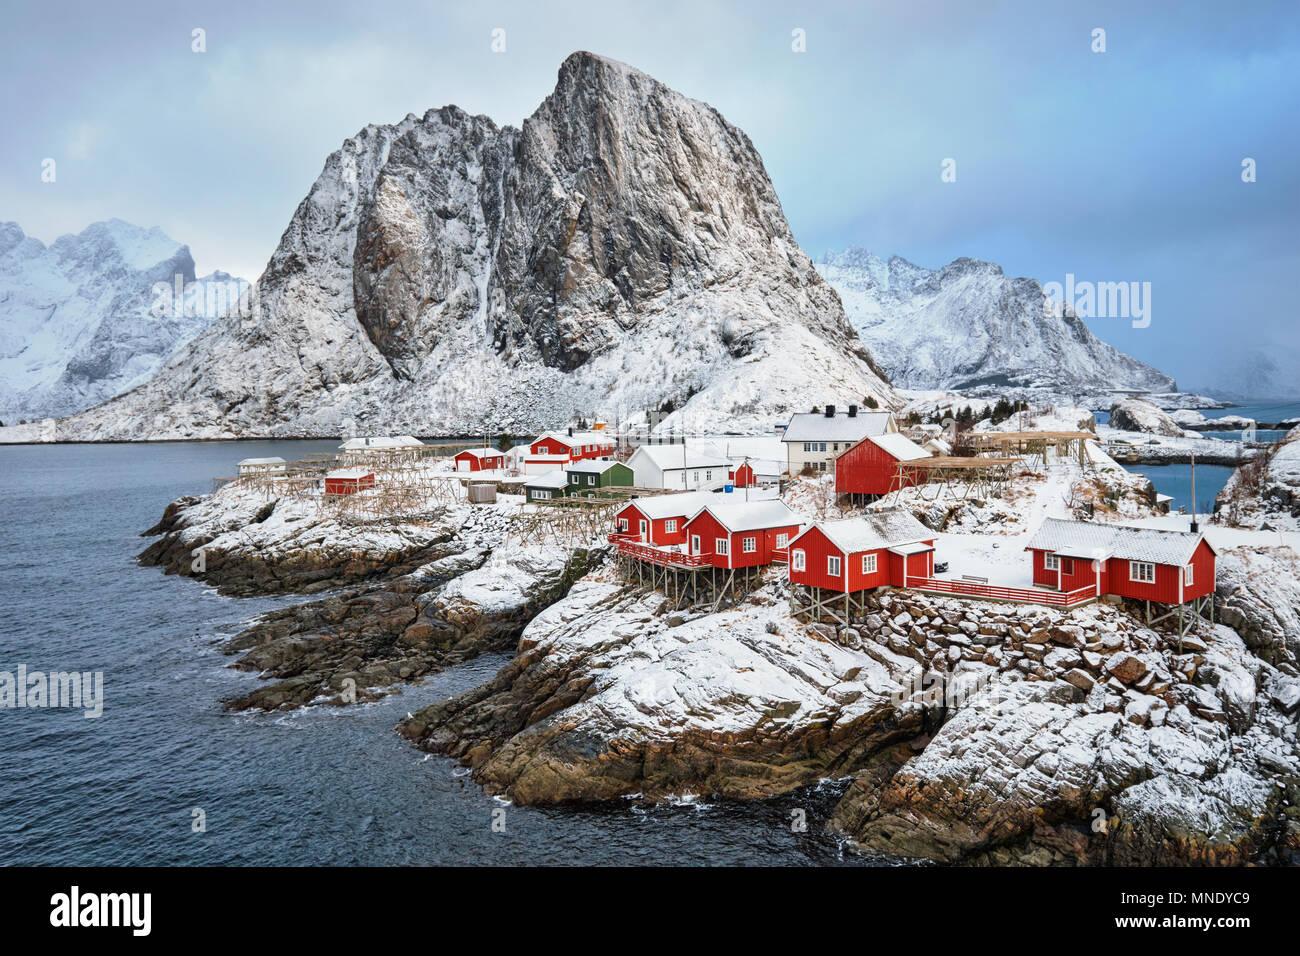 Hamnoy poblado pesquero en las islas Lofoten, Noruega Foto de stock